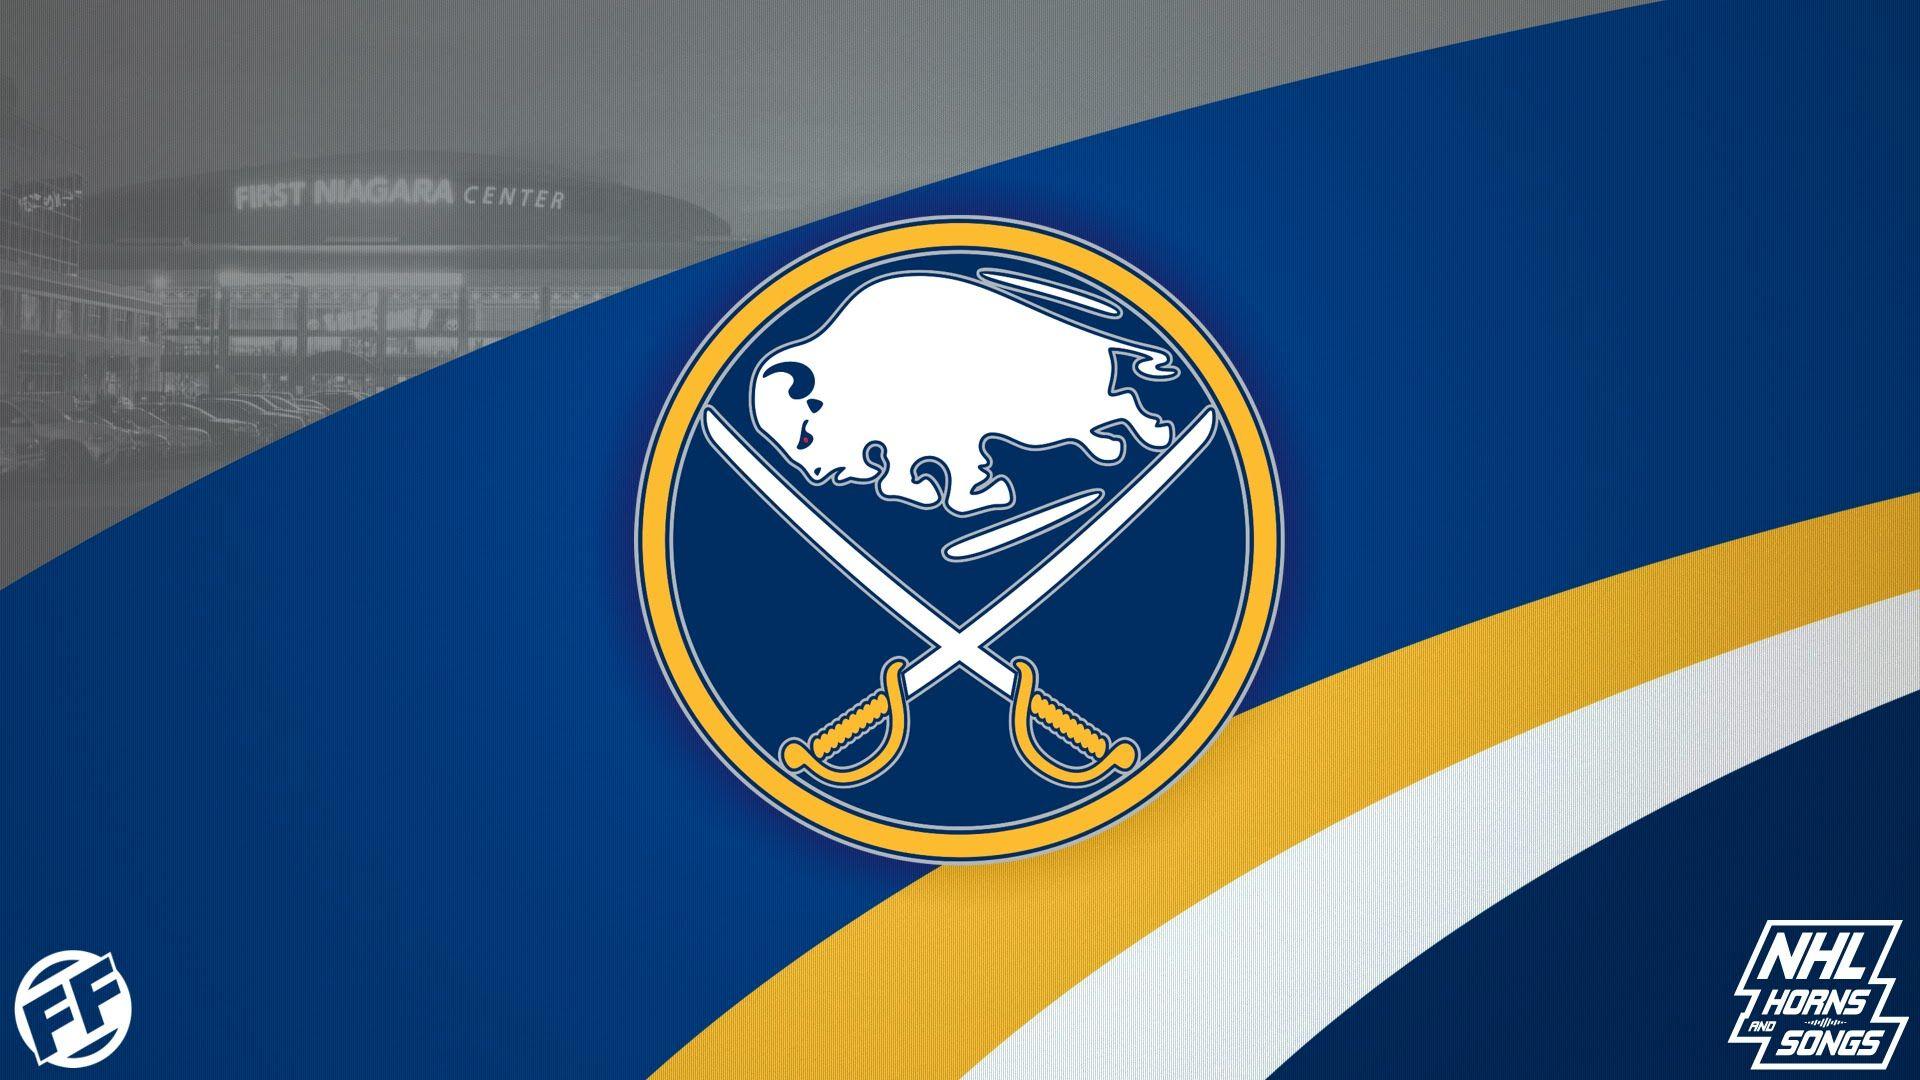 Buffalo Sabres 2015 2016 Goal Horn Buffalo Sabres Nhl Logos Nhl